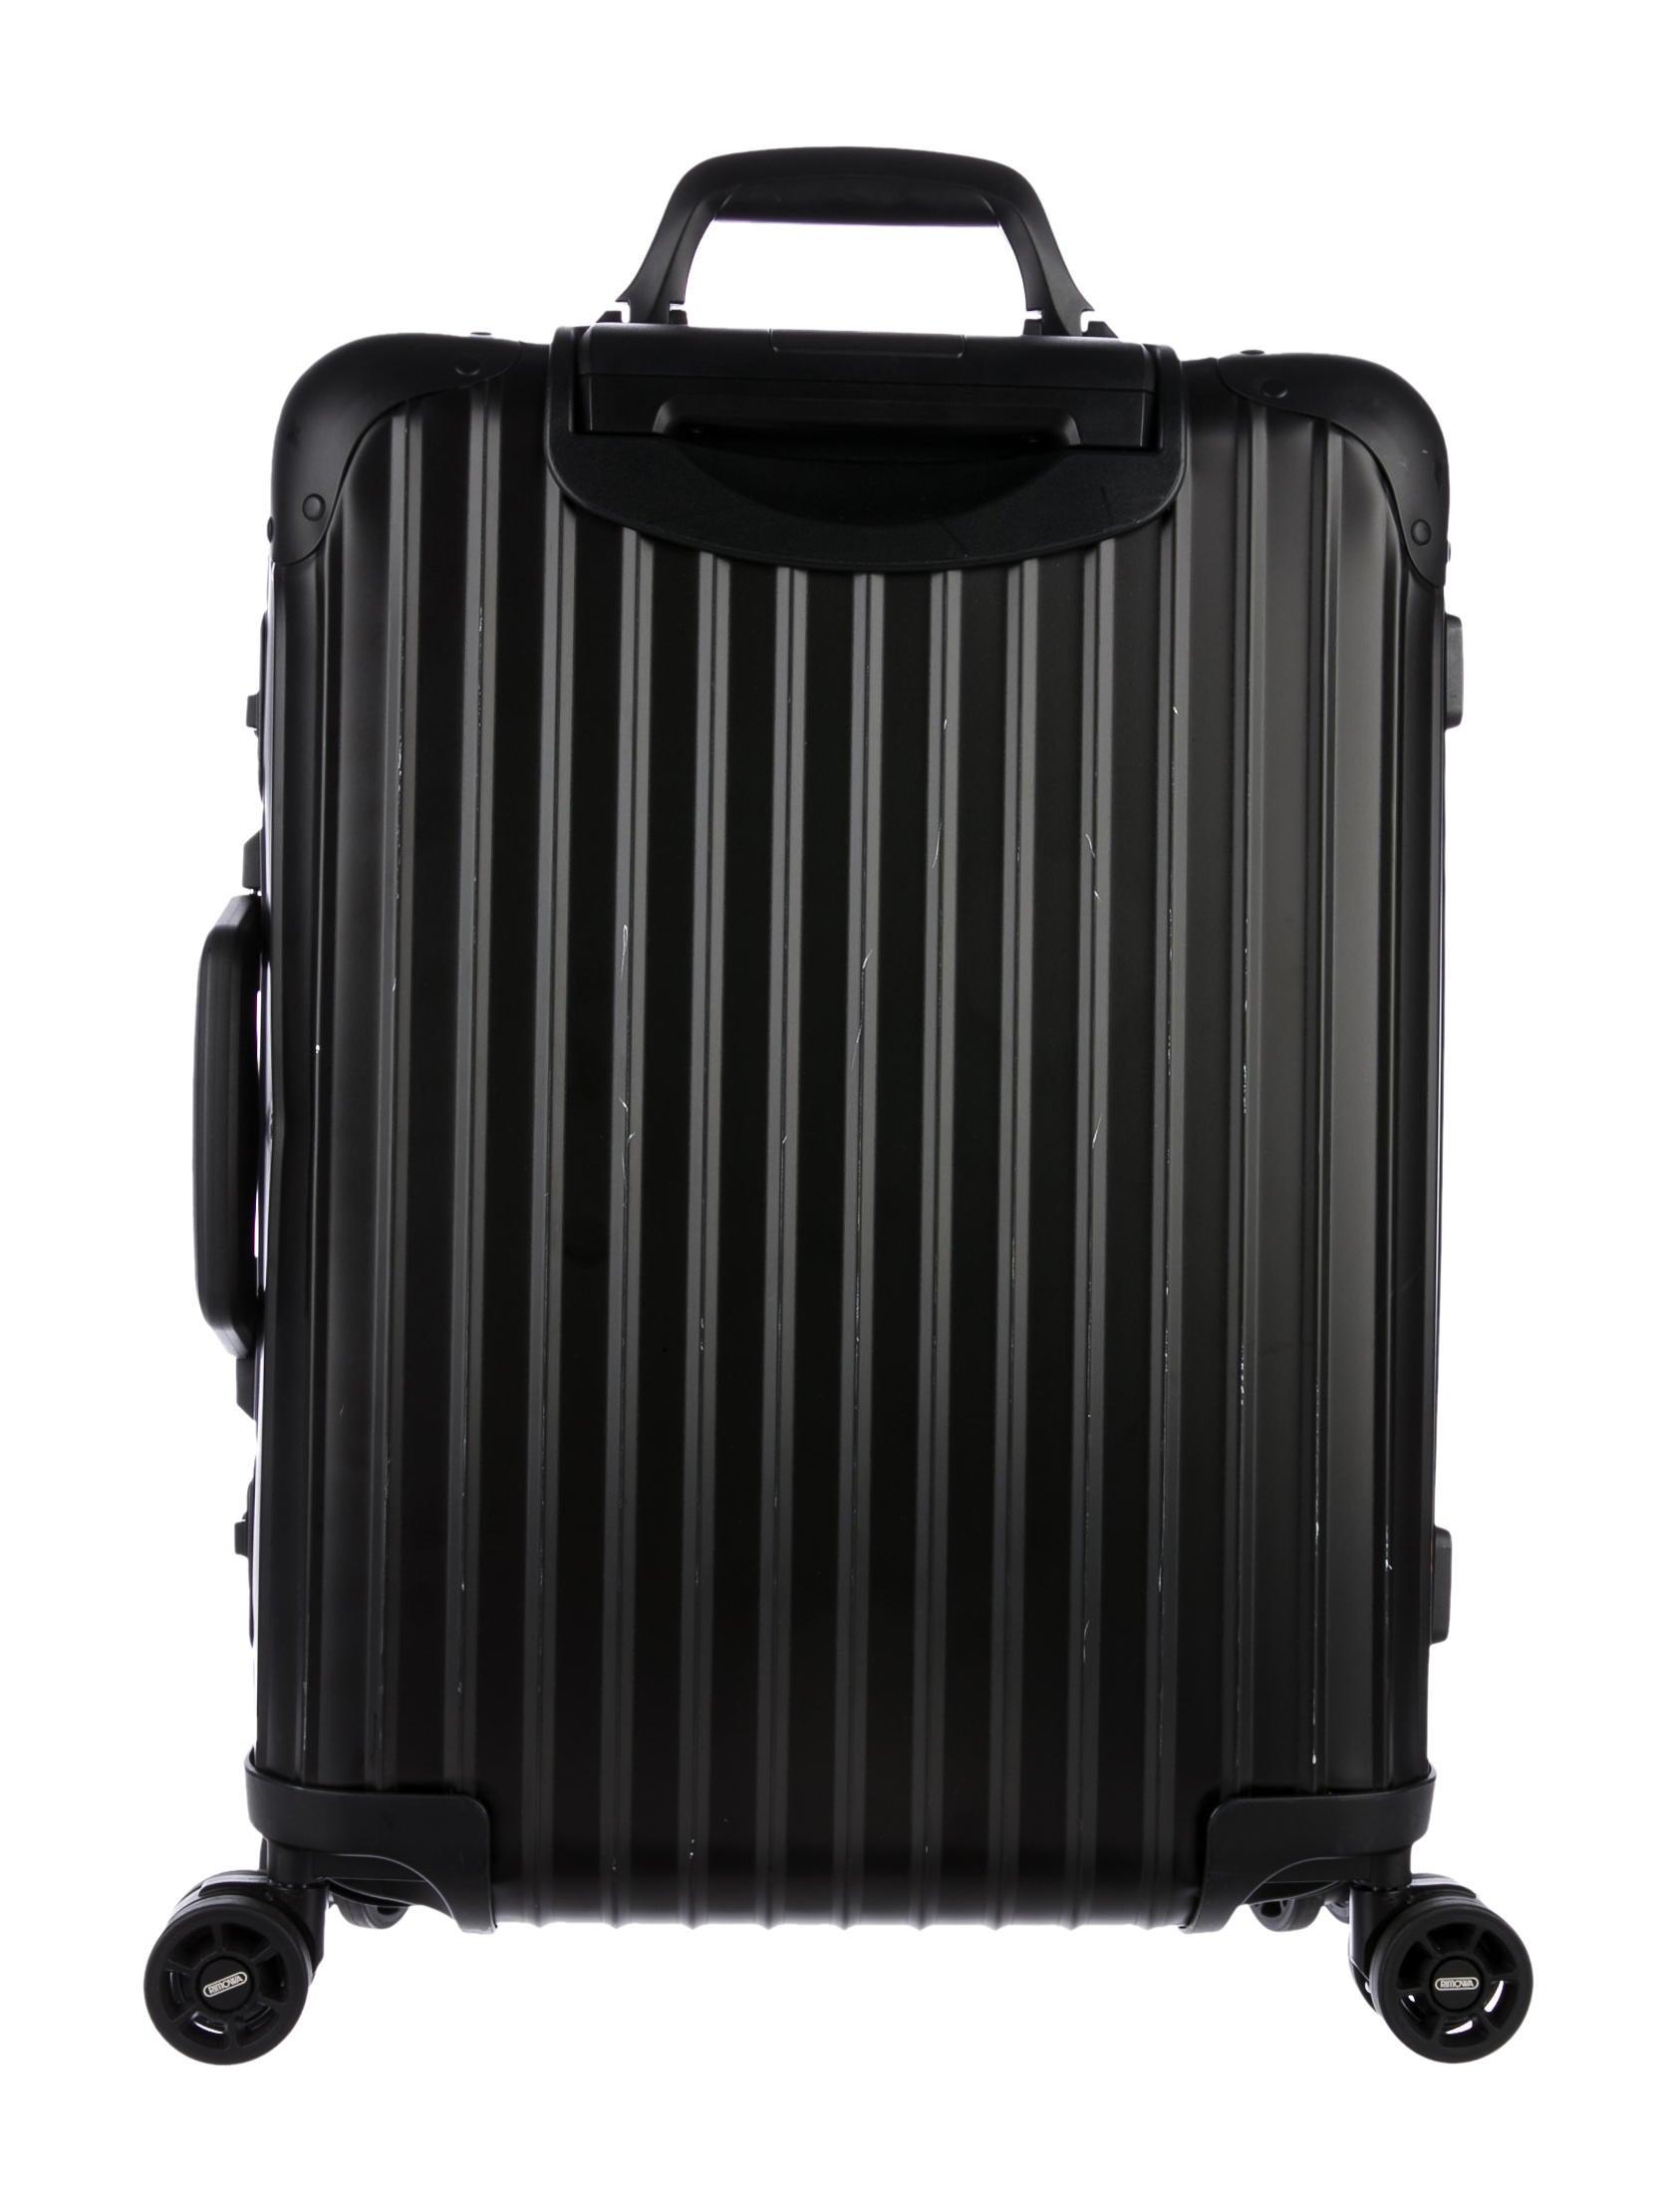 rimowa salsa cabin multiwheel 32 0l luggage rwa20131 the realreal. Black Bedroom Furniture Sets. Home Design Ideas